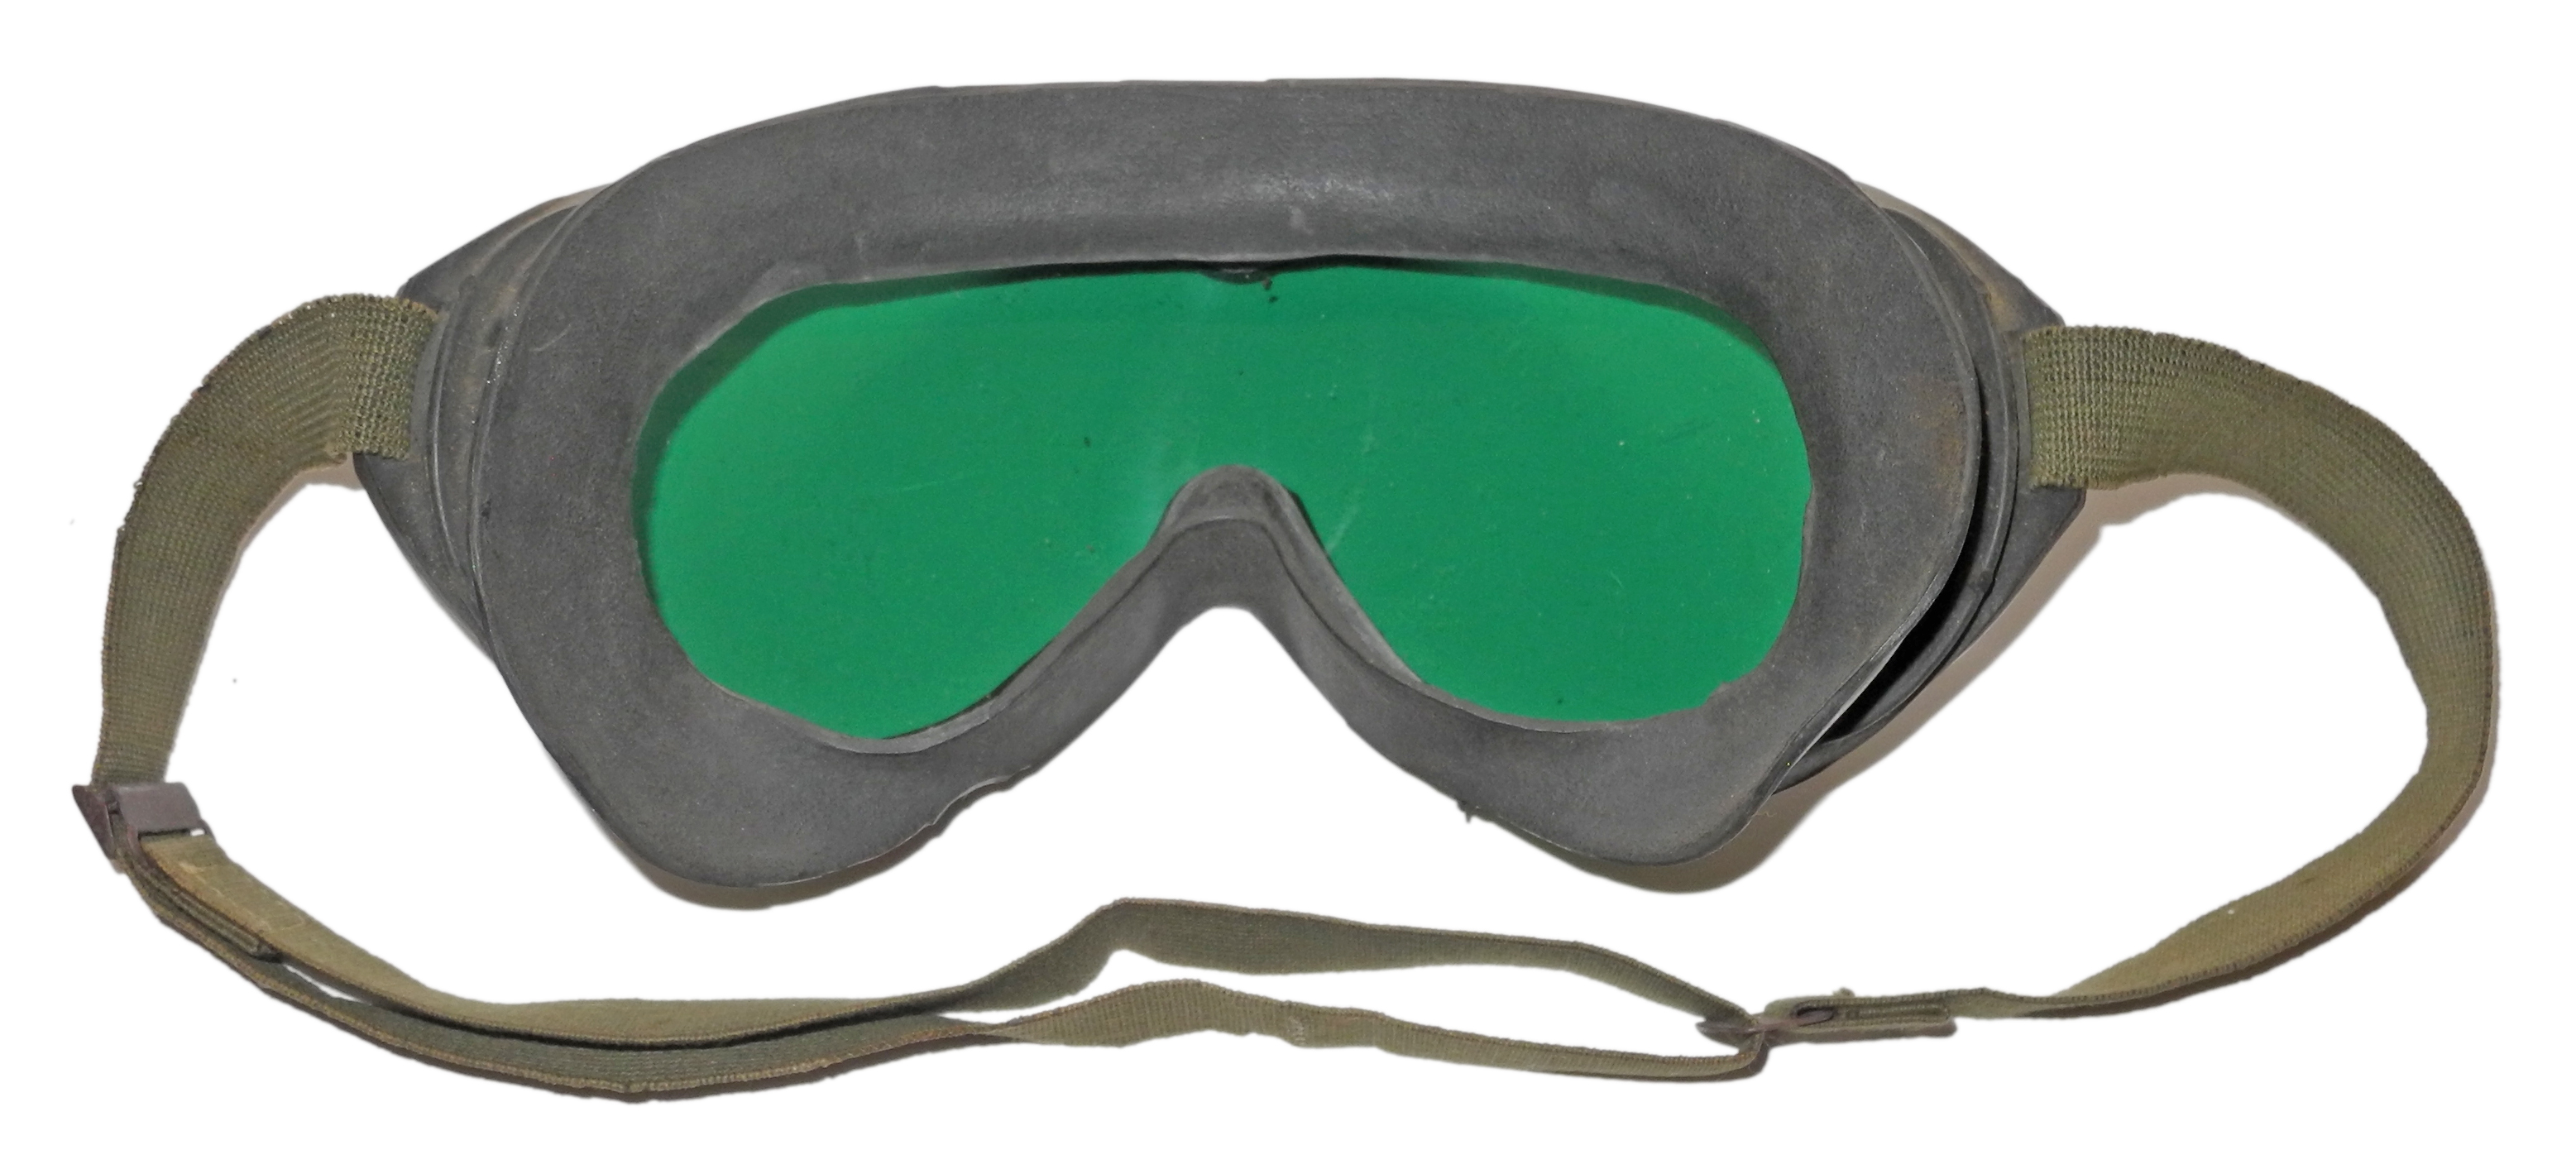 AAF Type M-1944 goggles